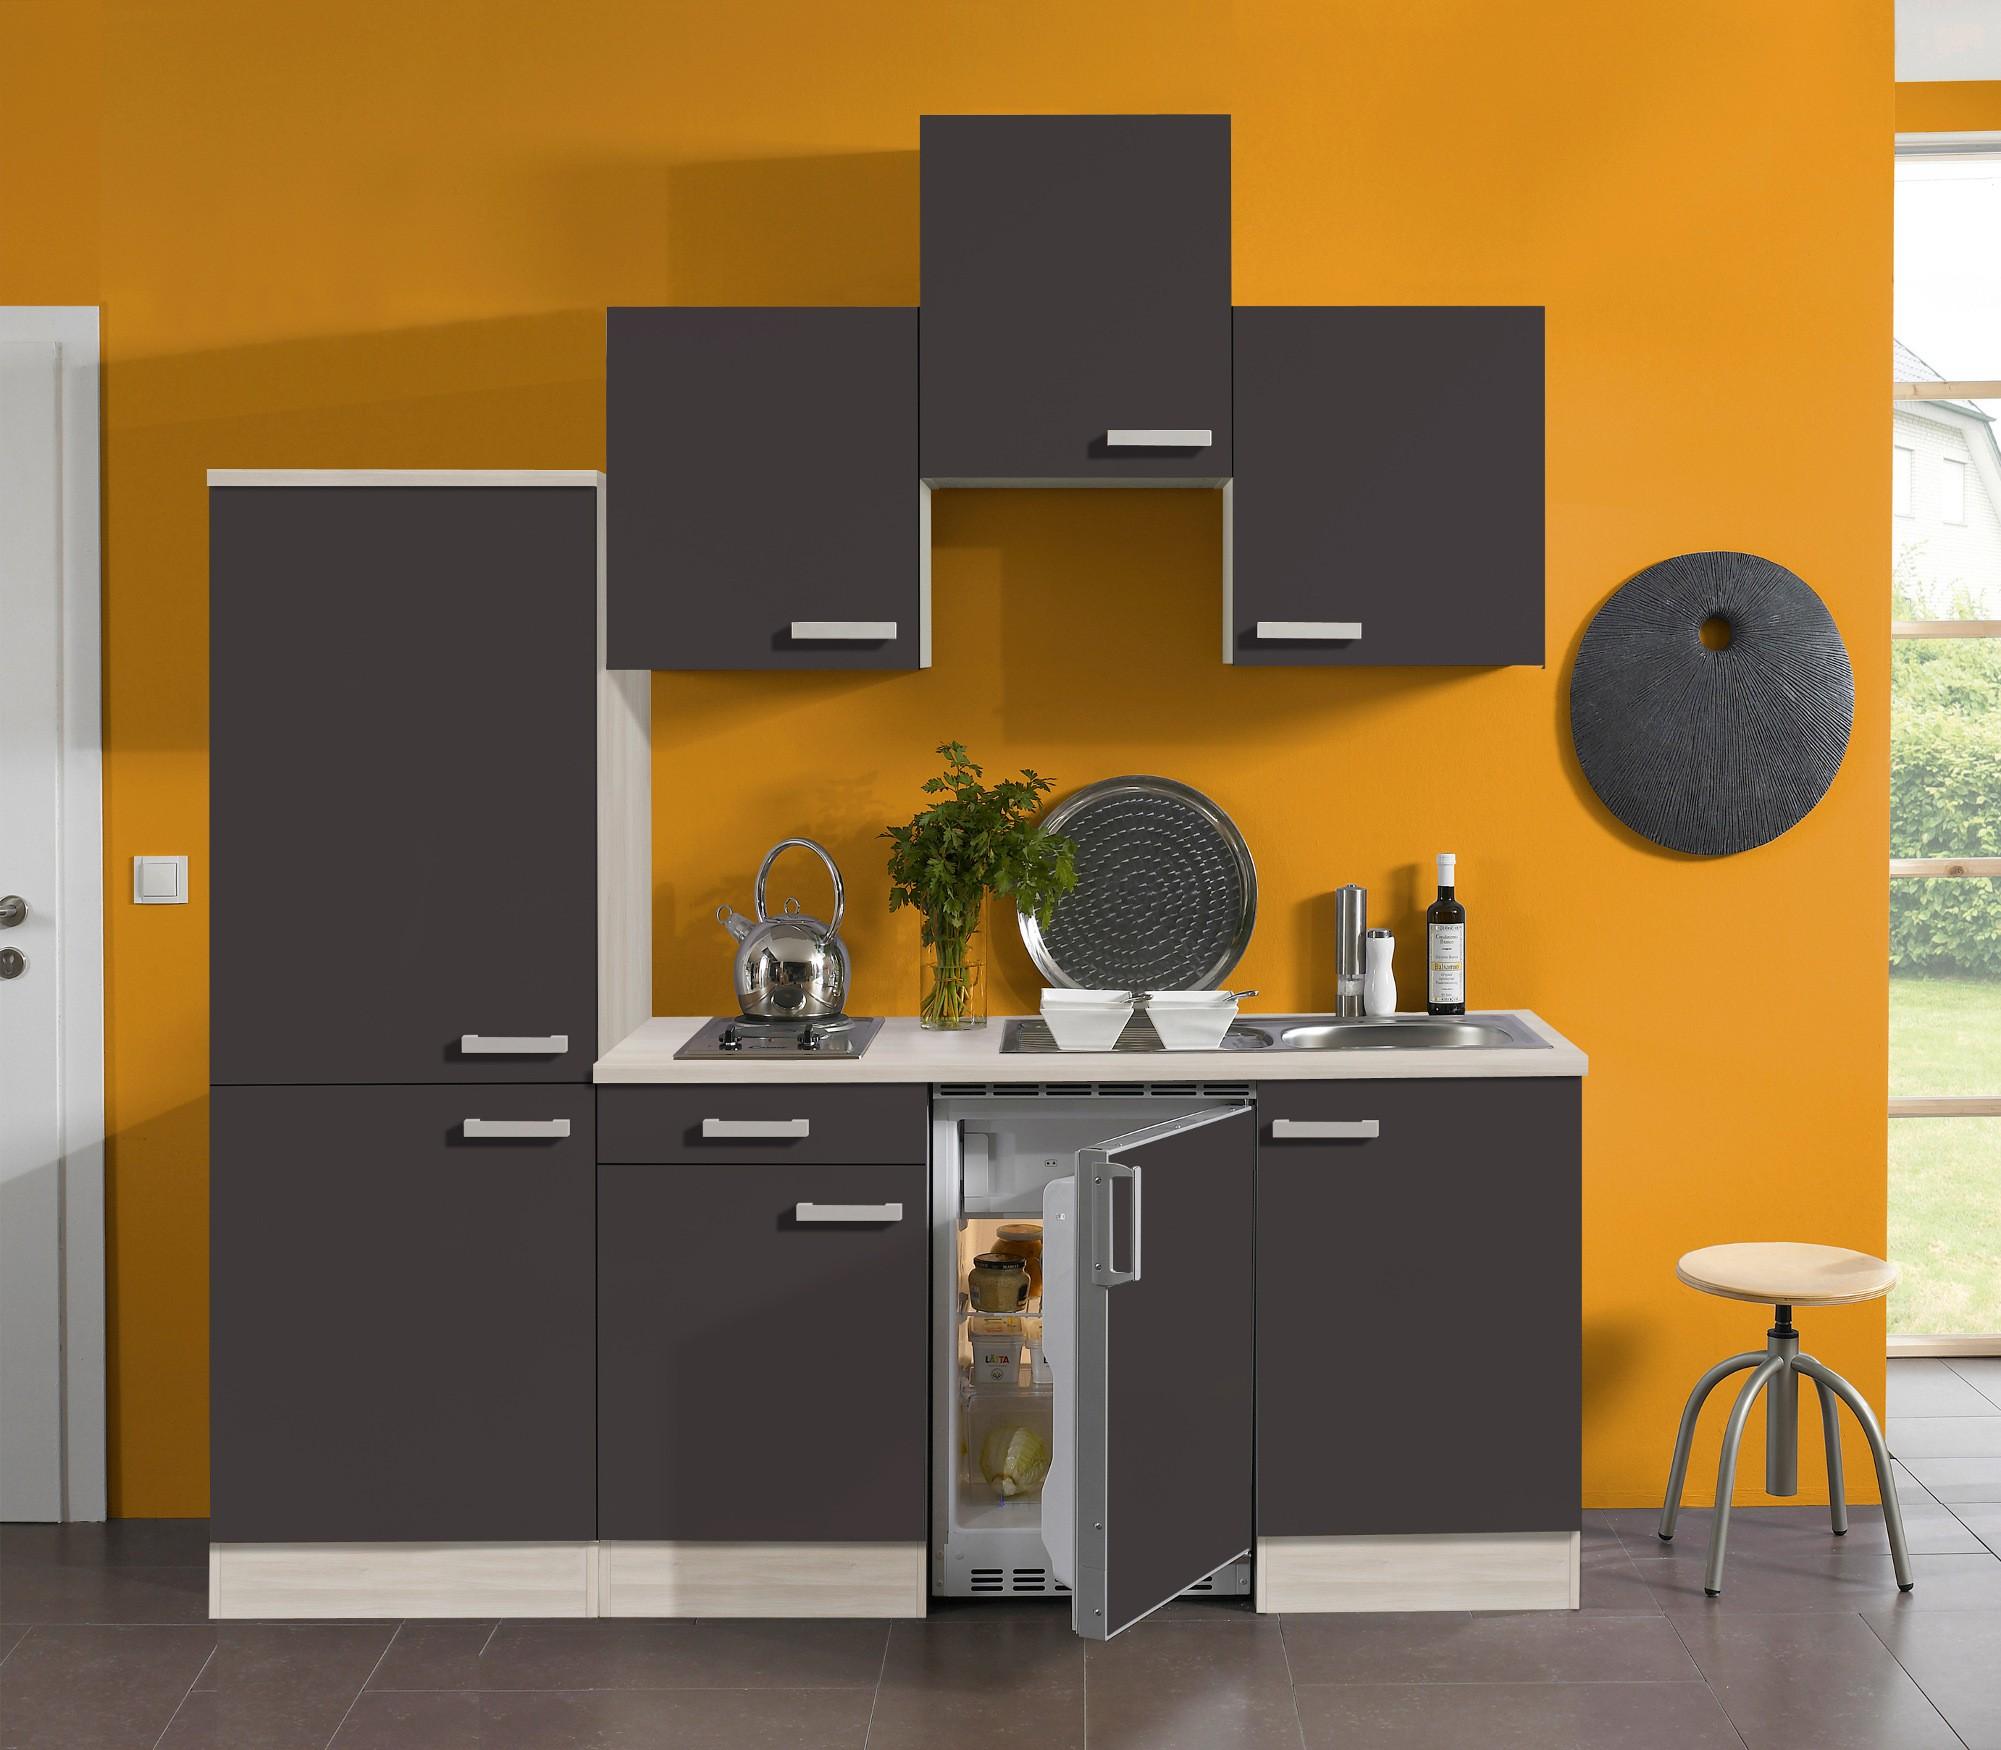 singlek che barcelona vario 1 mit elektro kochfeld breite 210 cm grau k che singlek chen. Black Bedroom Furniture Sets. Home Design Ideas